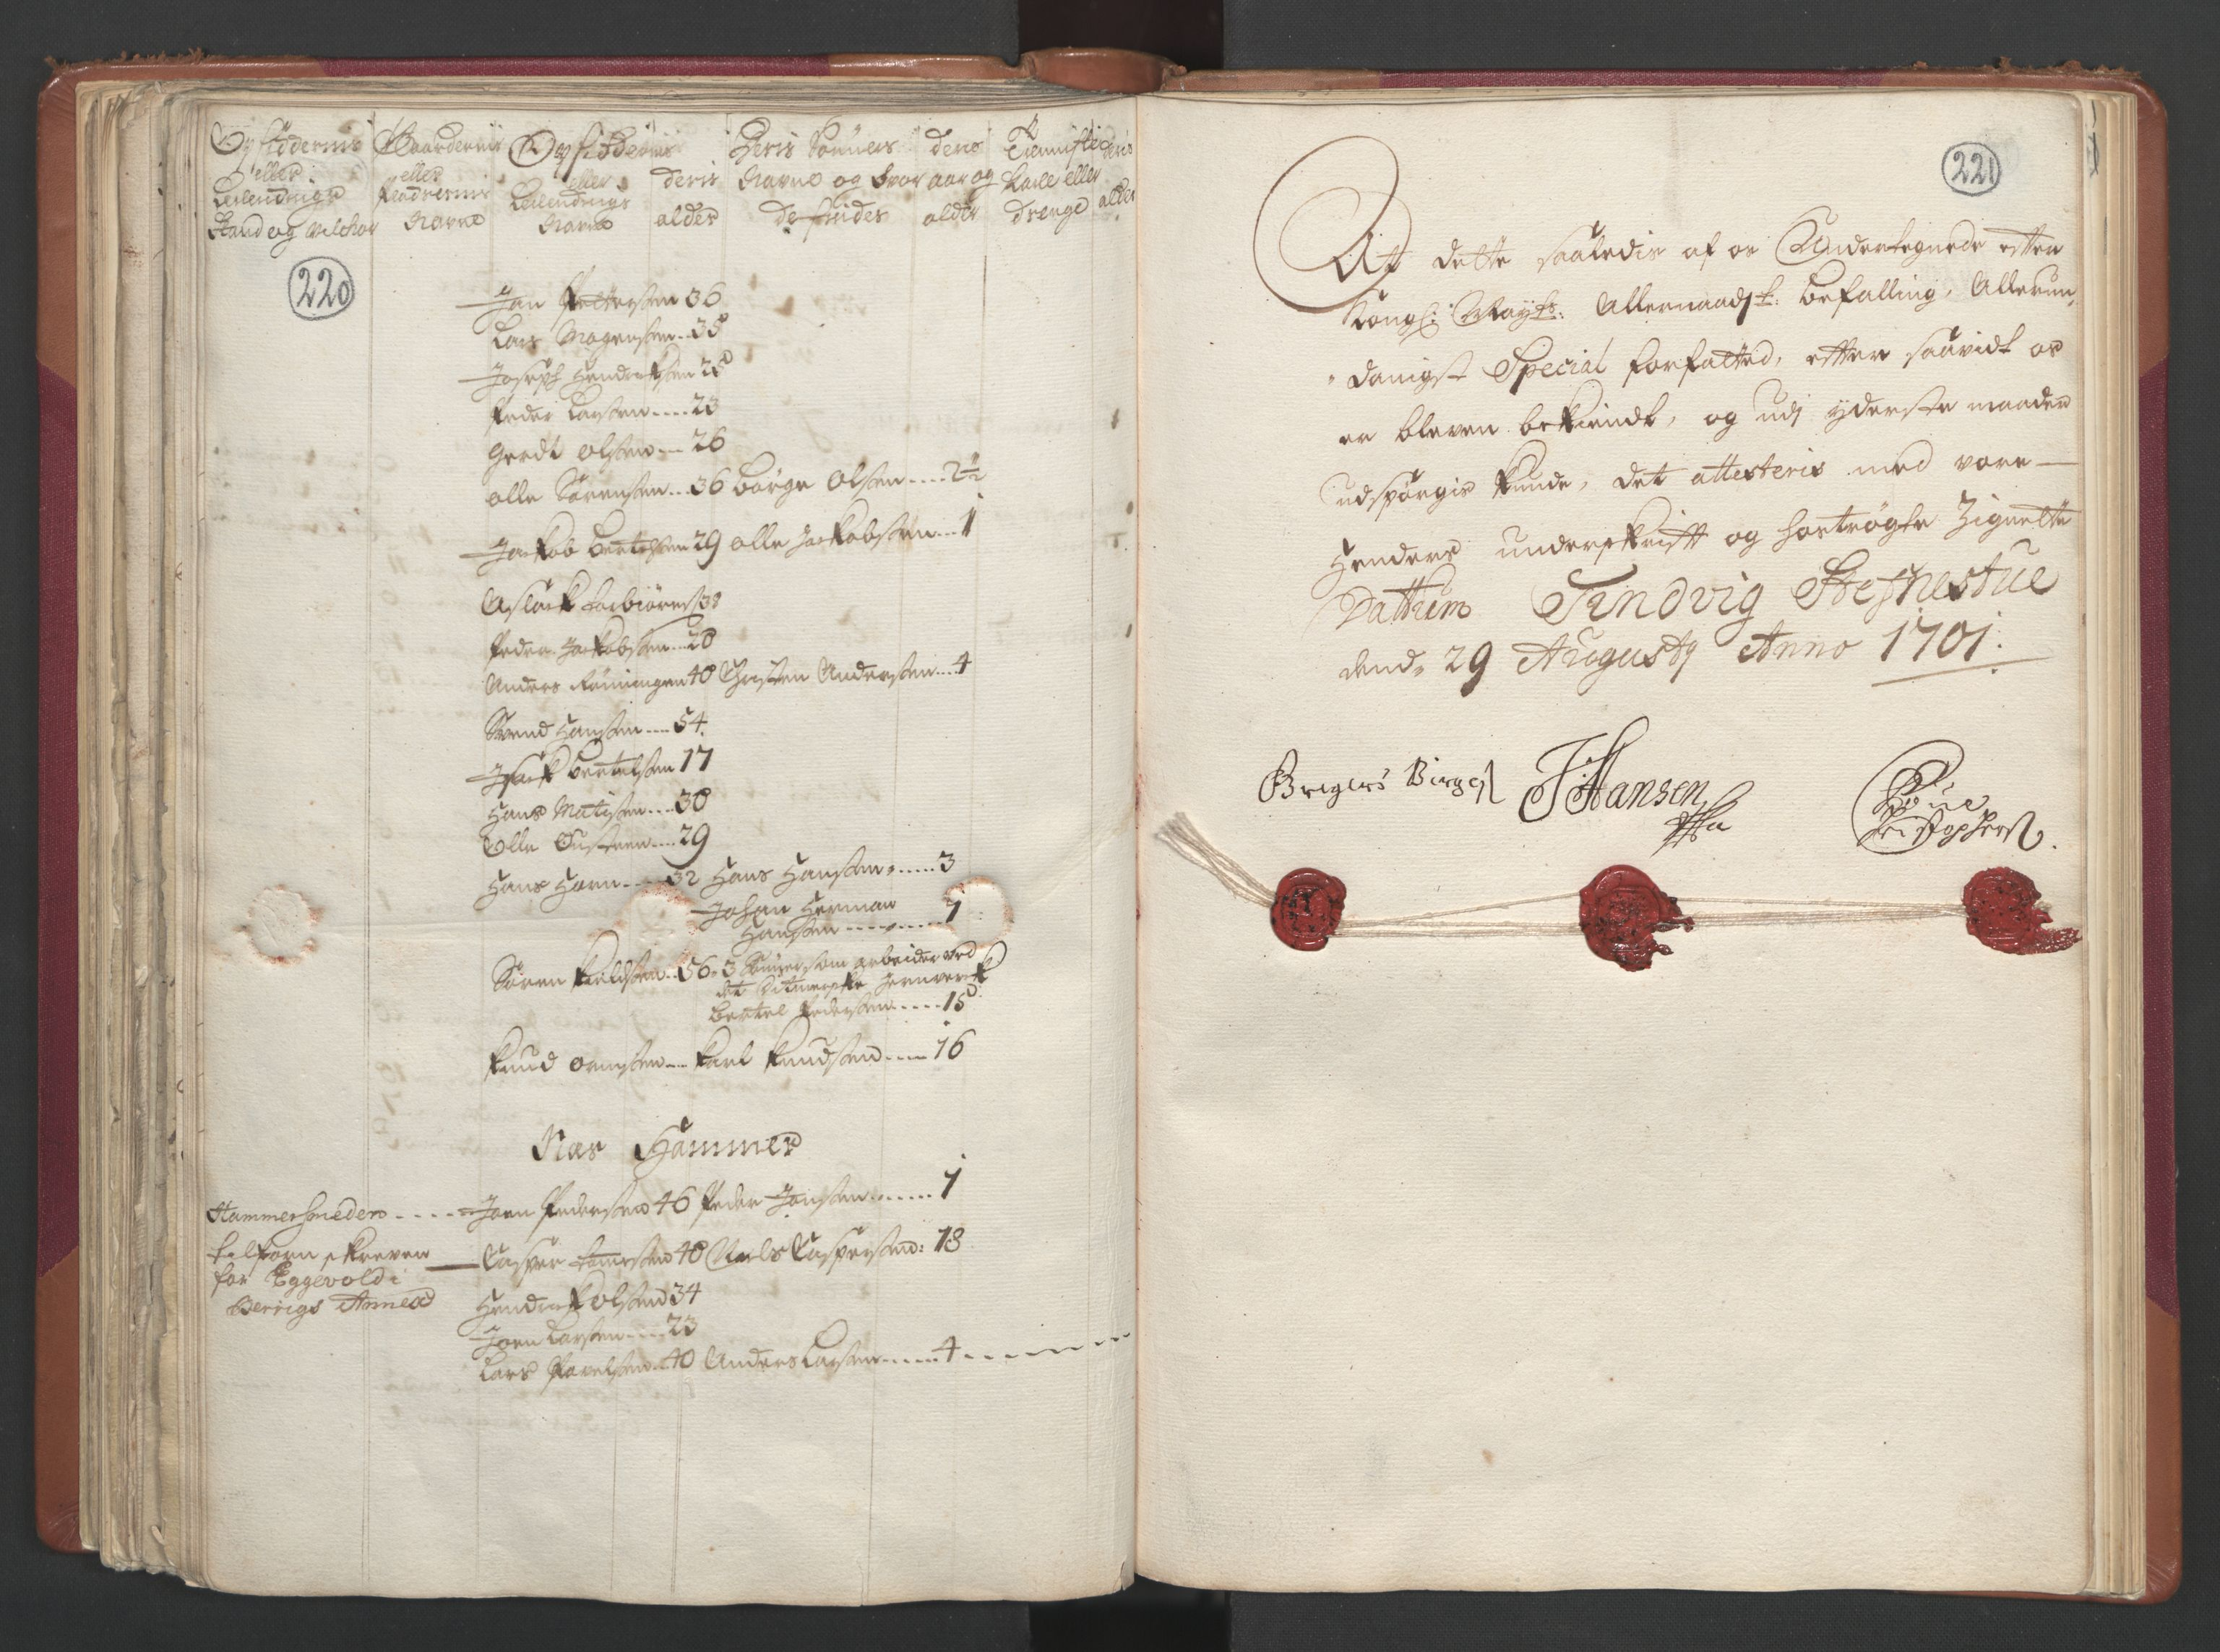 RA, Manntallet 1701, nr. 2: Solør, Odal og Østerdal fogderi og Larvik grevskap, 1701, s. 220-221